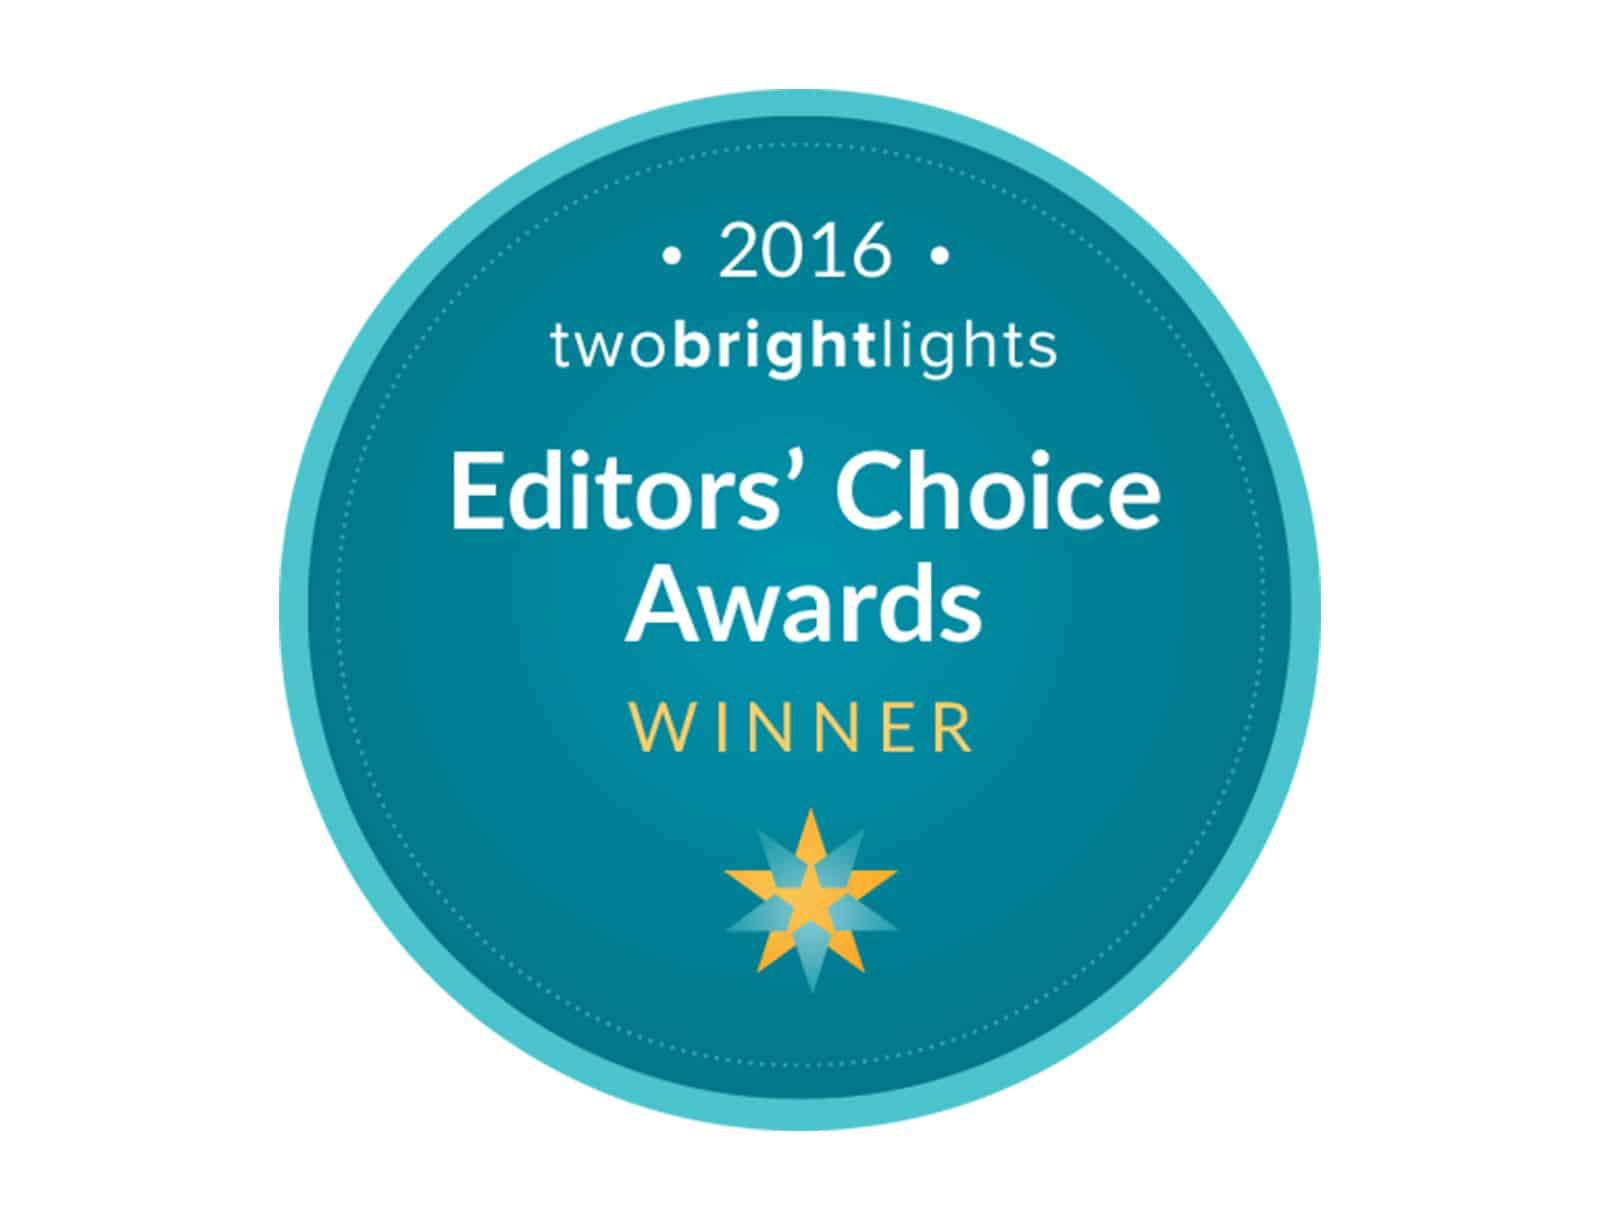 Two Bright Lights Editor's Choice Award Winner 2016